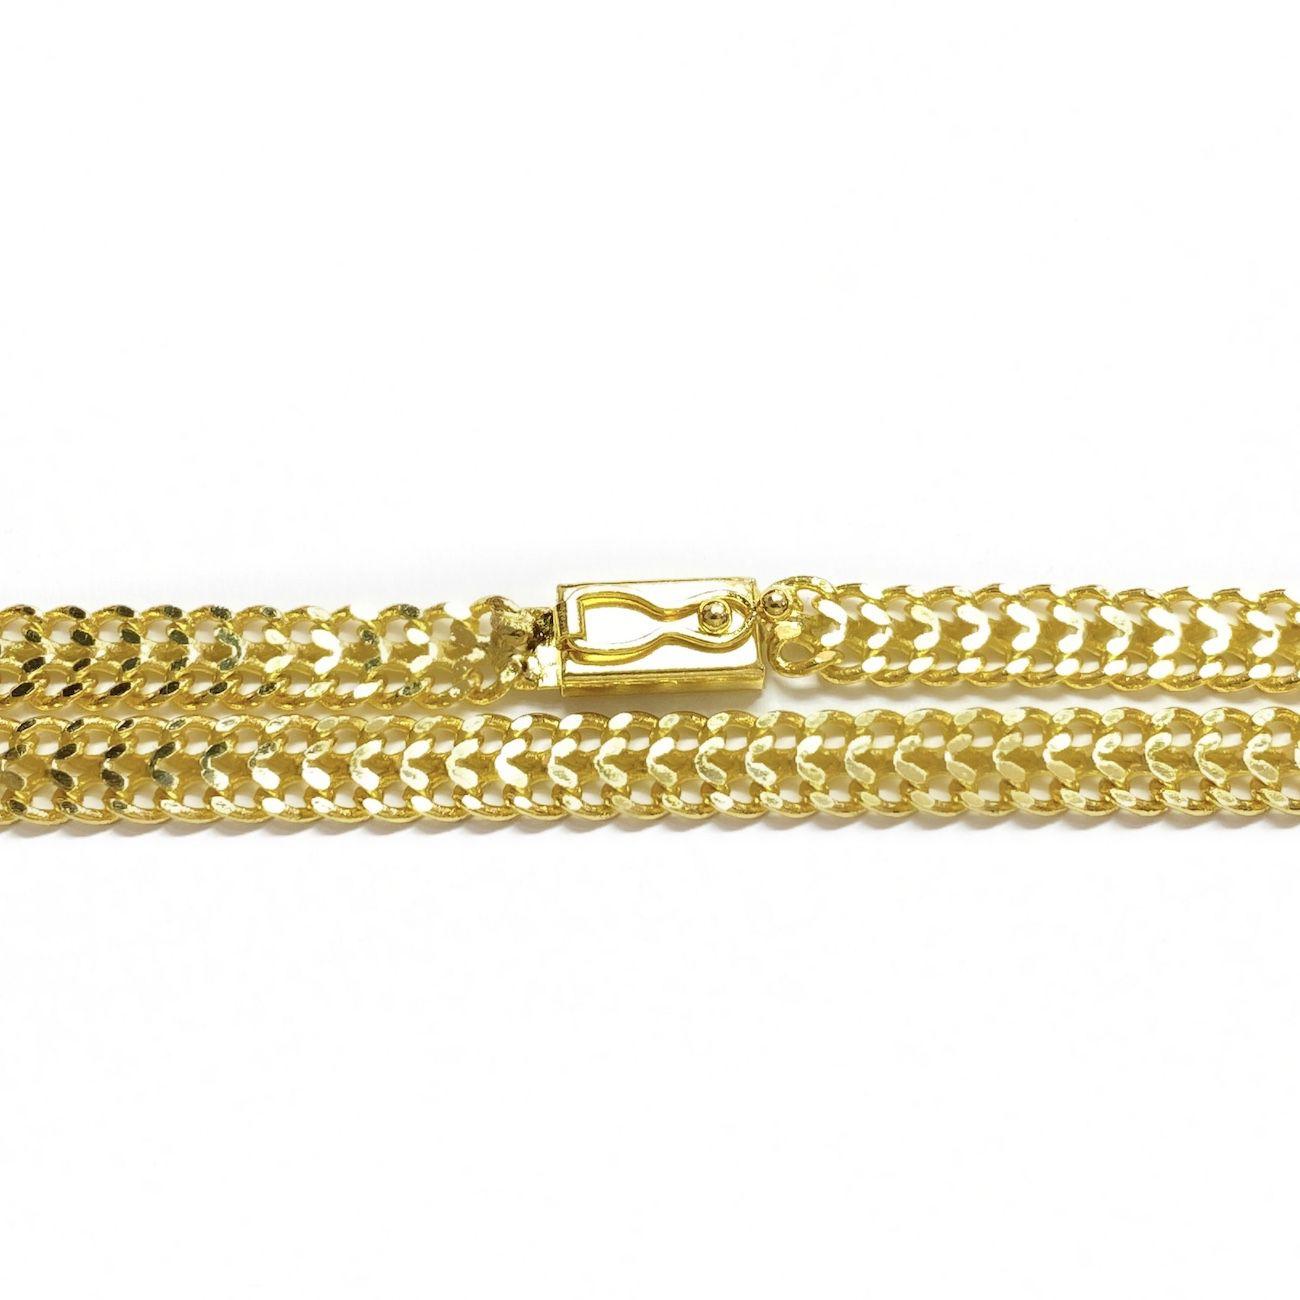 Corrente Grumet Union 6mm 60cm (22,1g) (Fecho Gaveta) (Banho Ouro 24K)